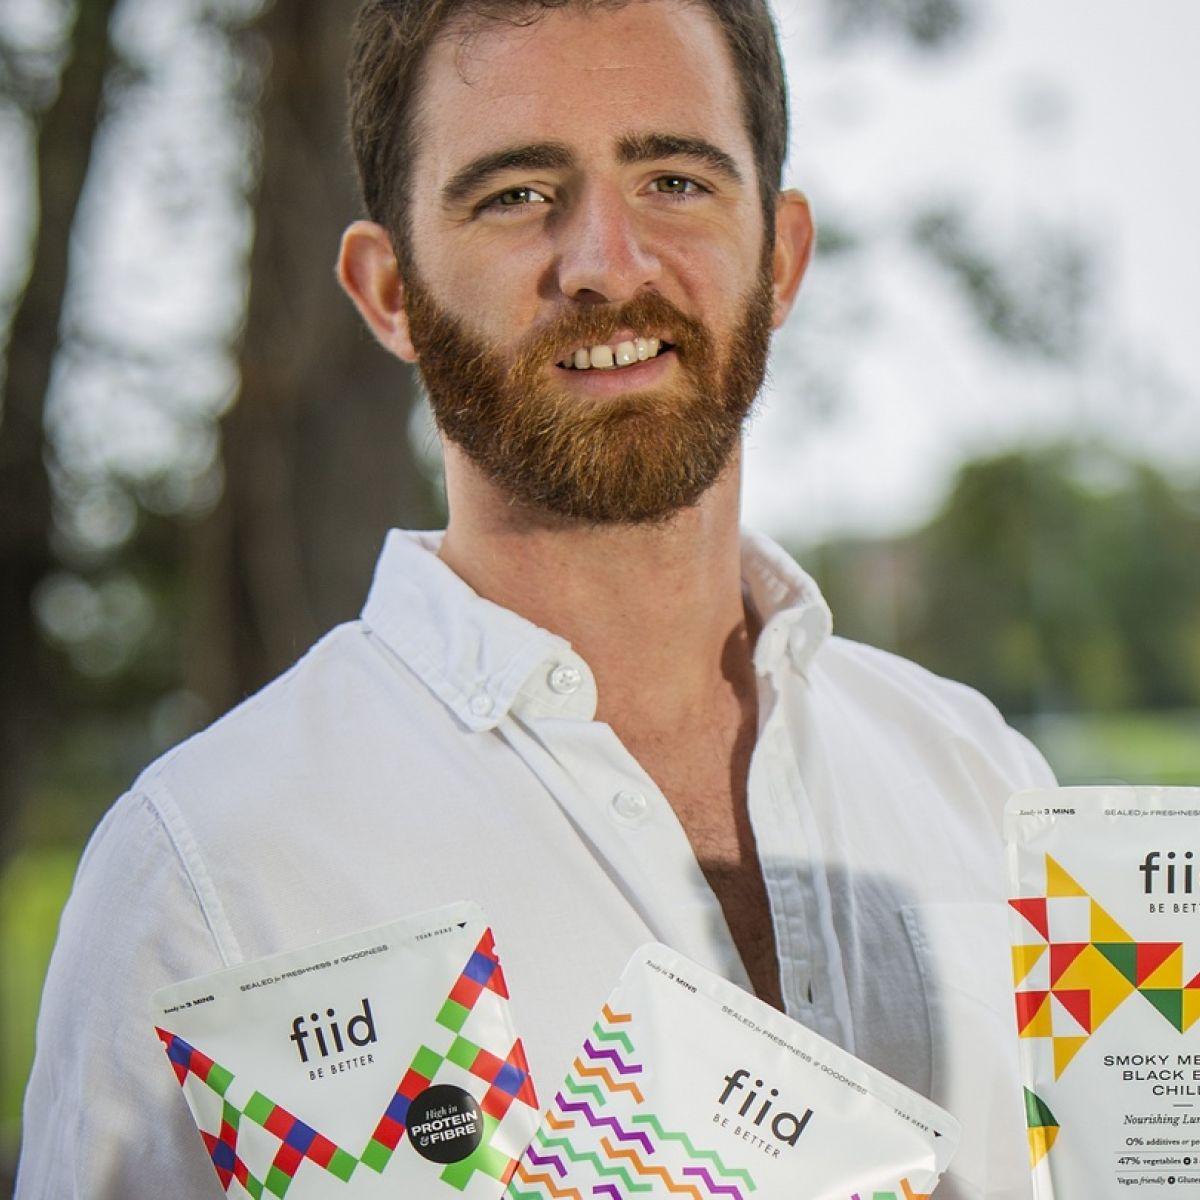 Business & Finance interview entrepreneur Shane Ryan, Fiid